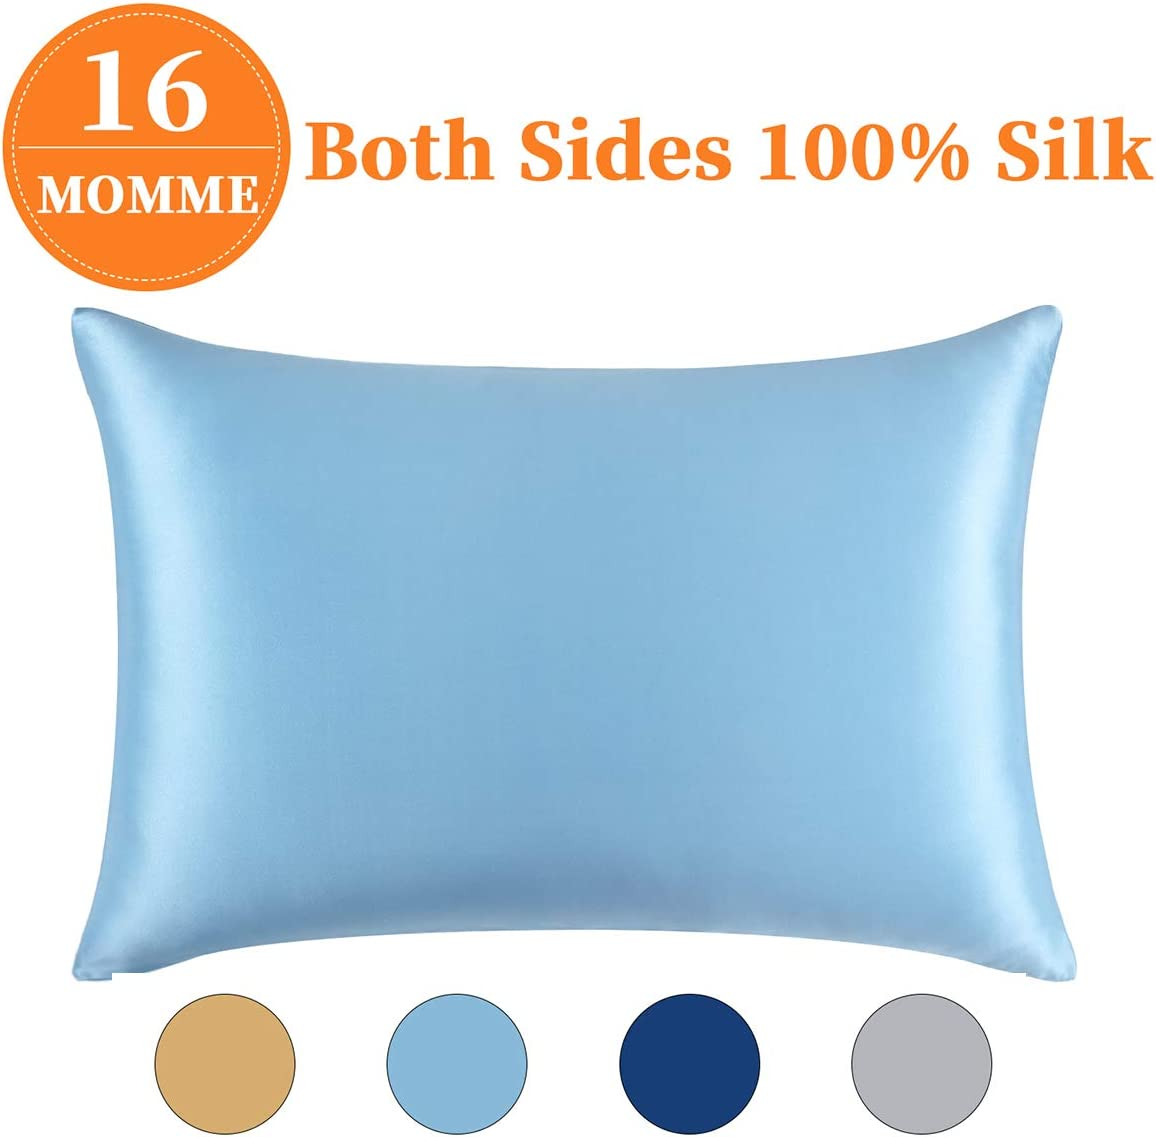 Amazon coupon code for Mulberry Silk Pillowcase